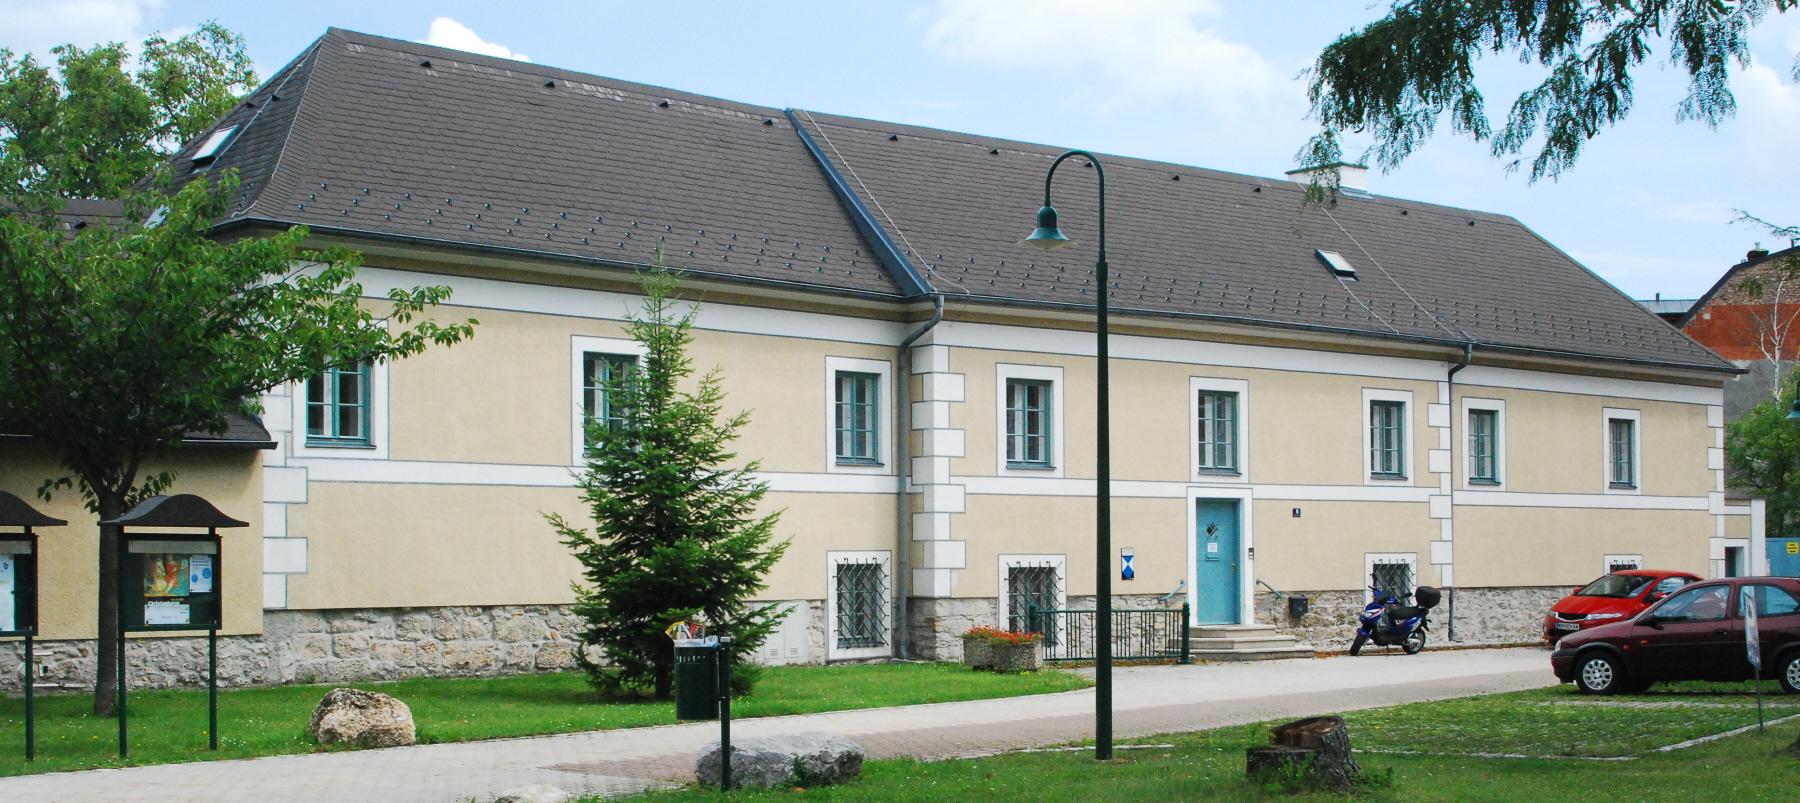 2601 Sollenau - menus2view.com